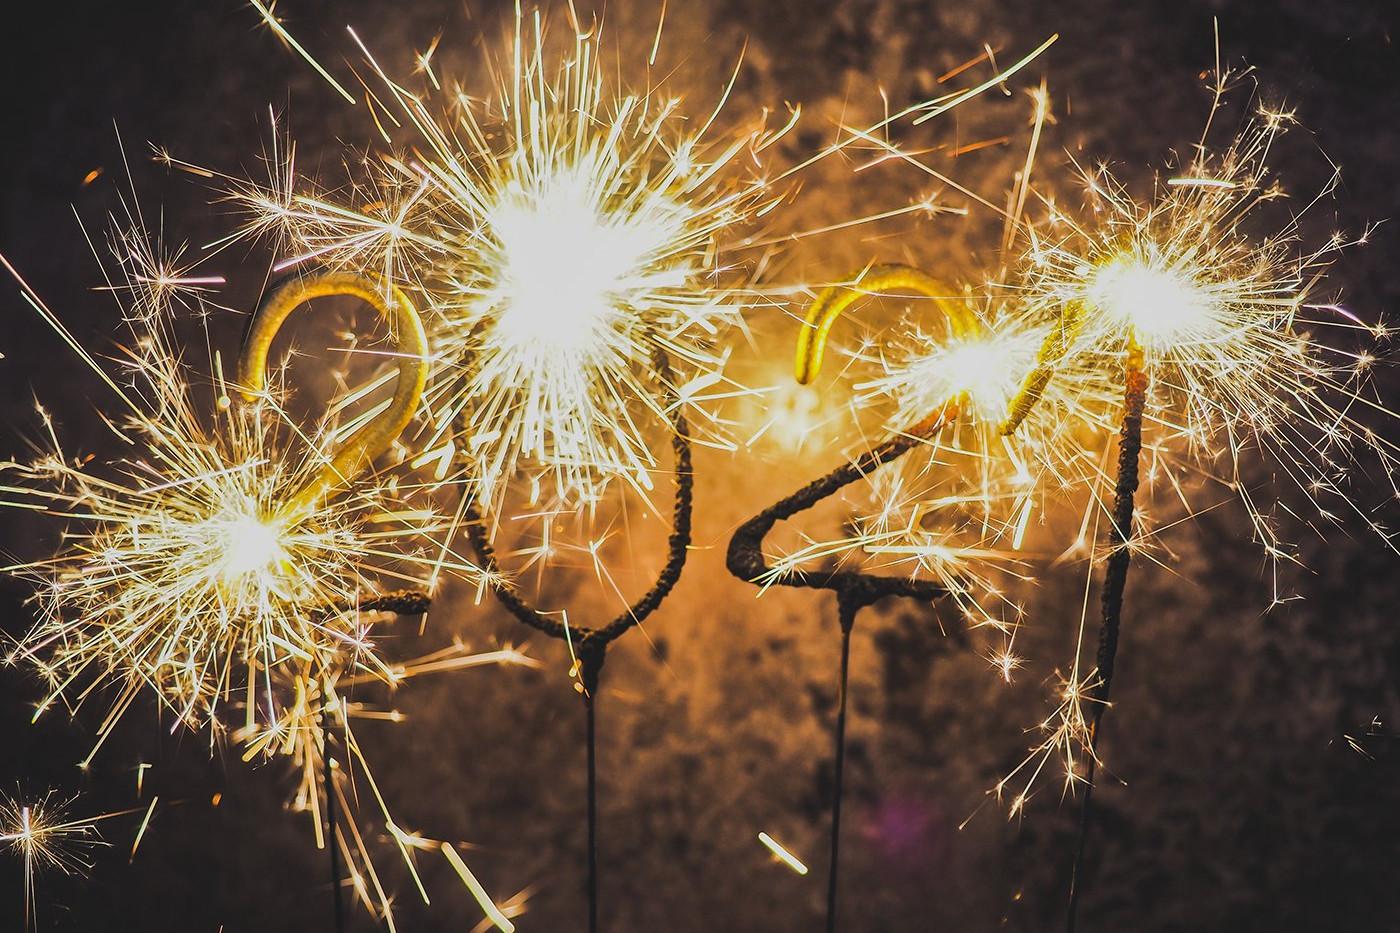 2021 Celebration with sparklers